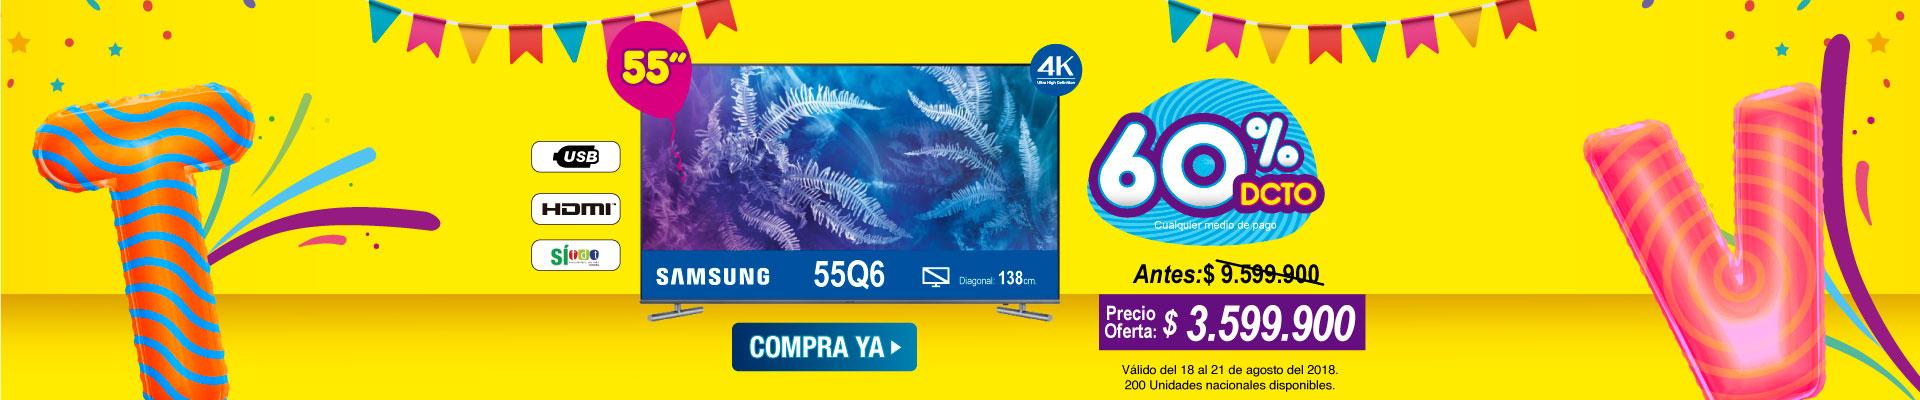 ALKP-PPAL-4-TV-PP---SAMSUNG-55Q6-Ago18